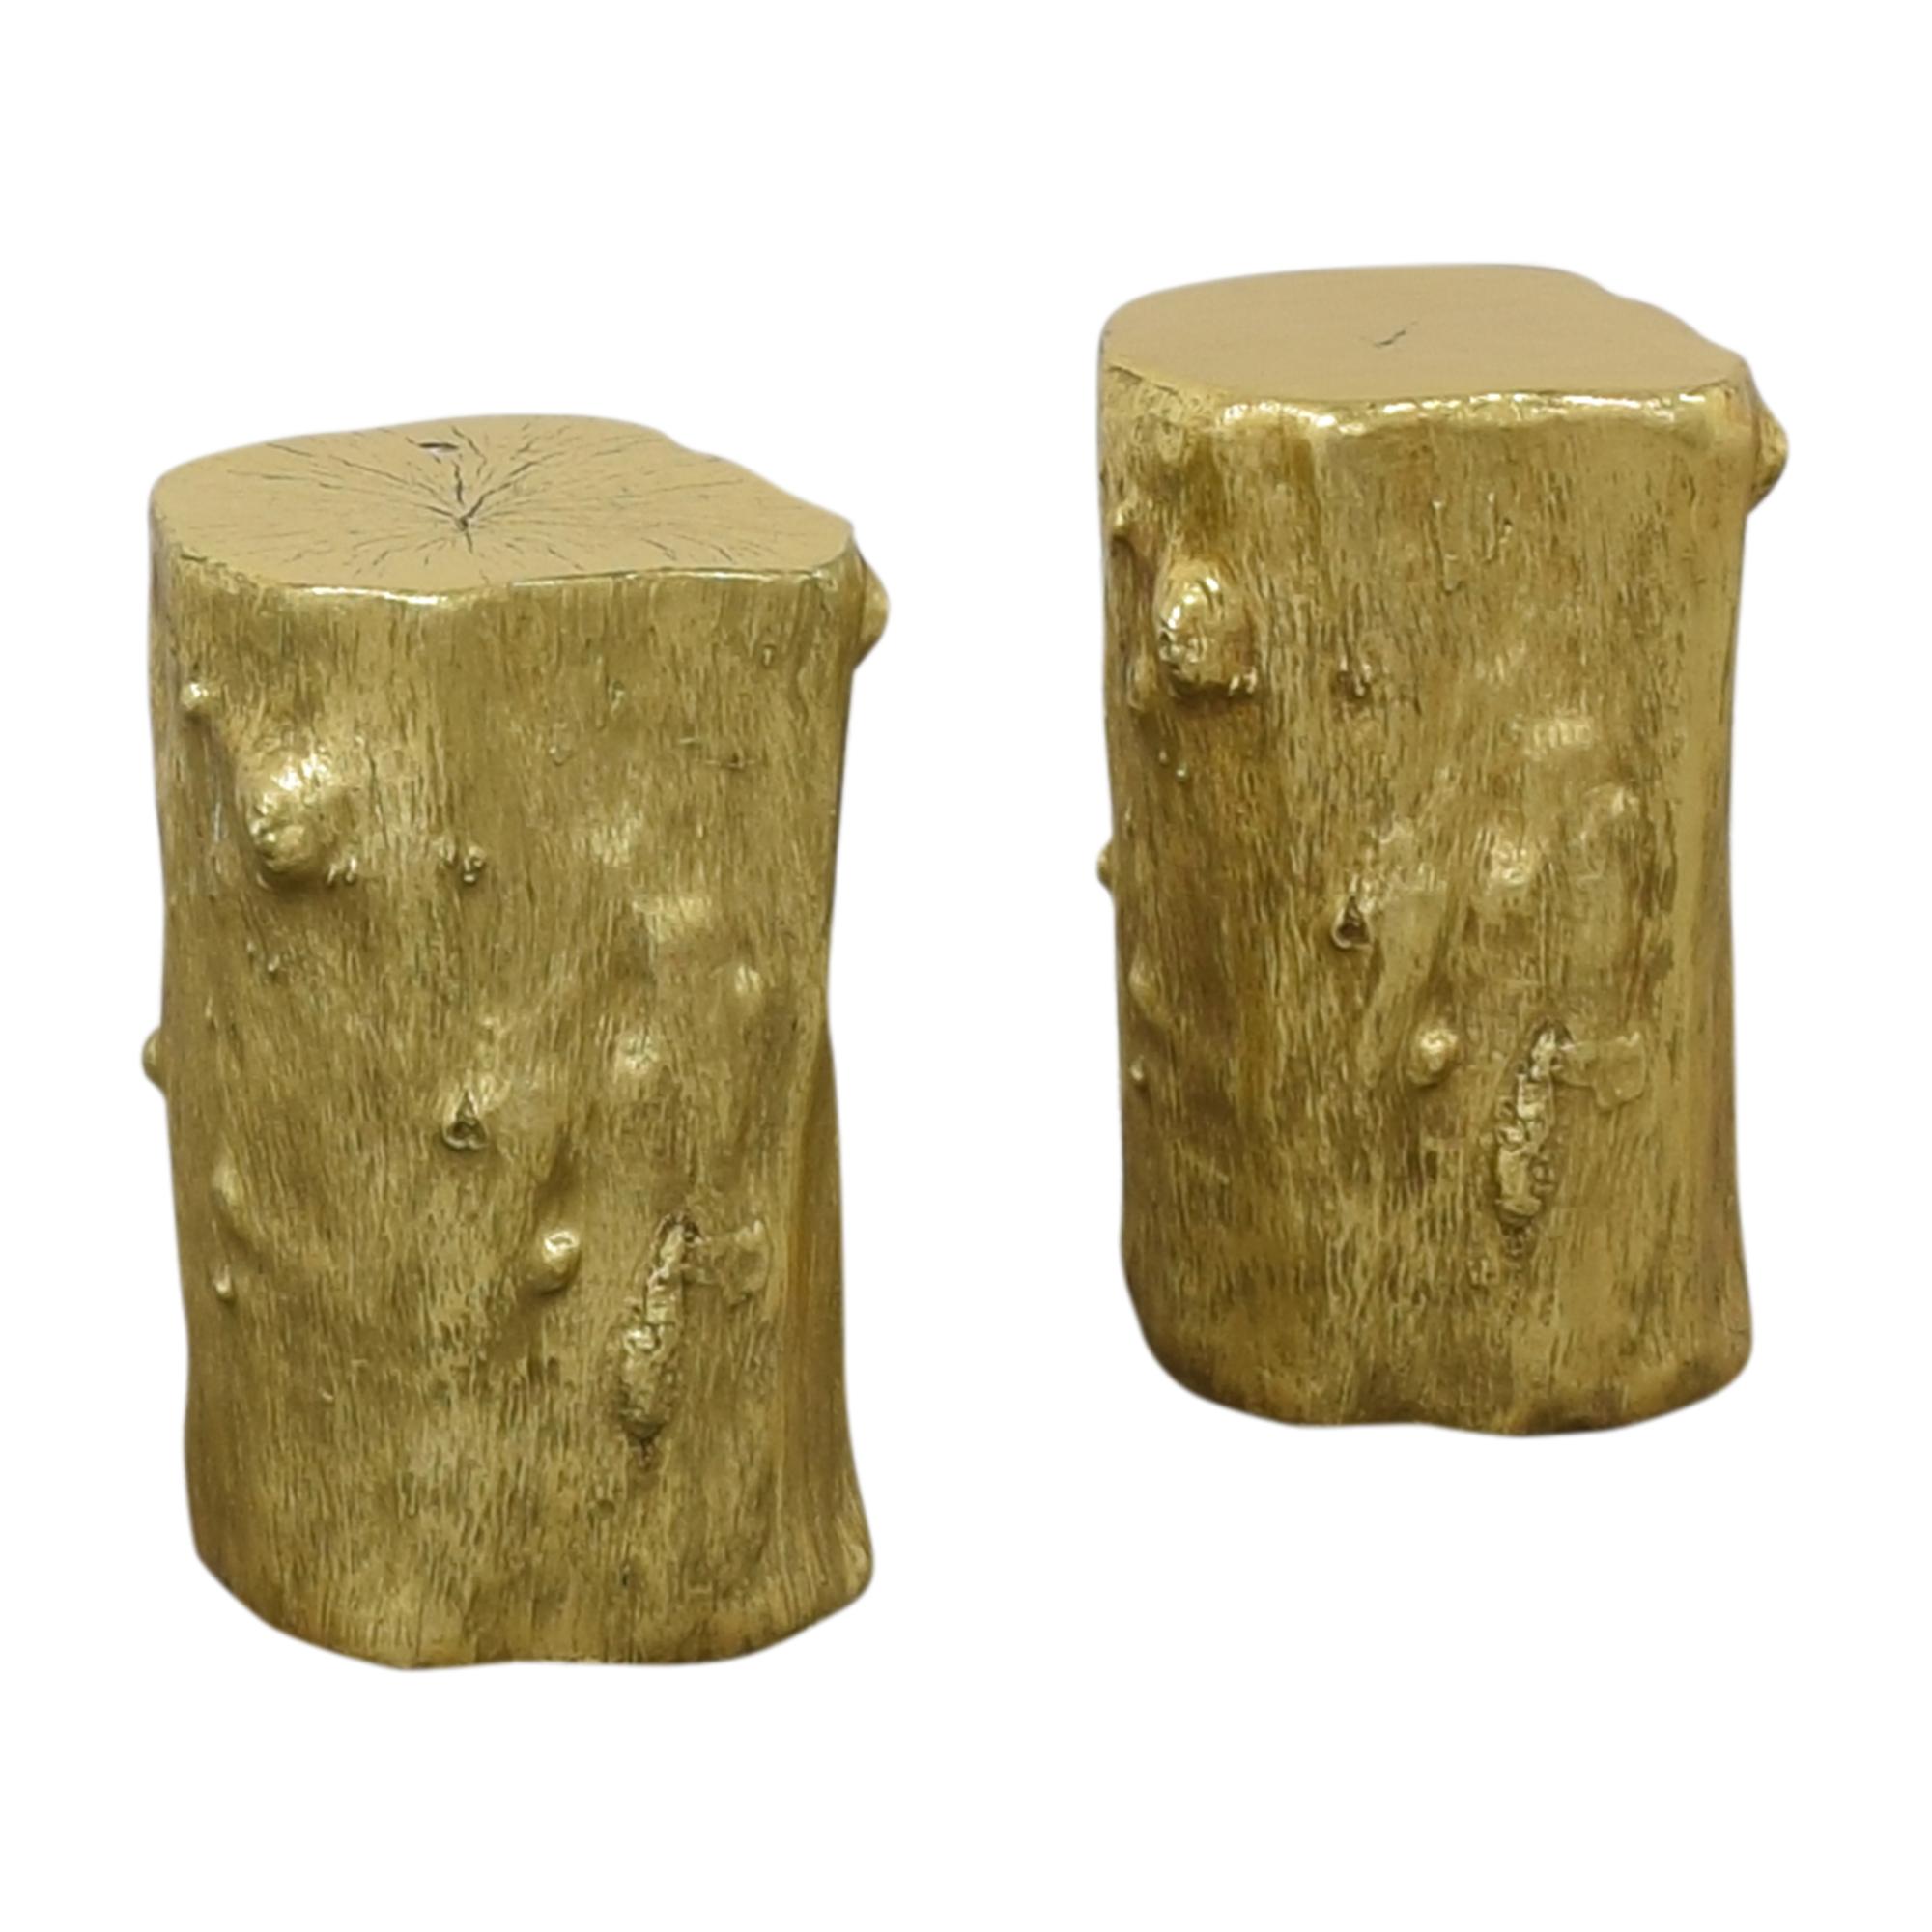 Decorative Log Stools pa